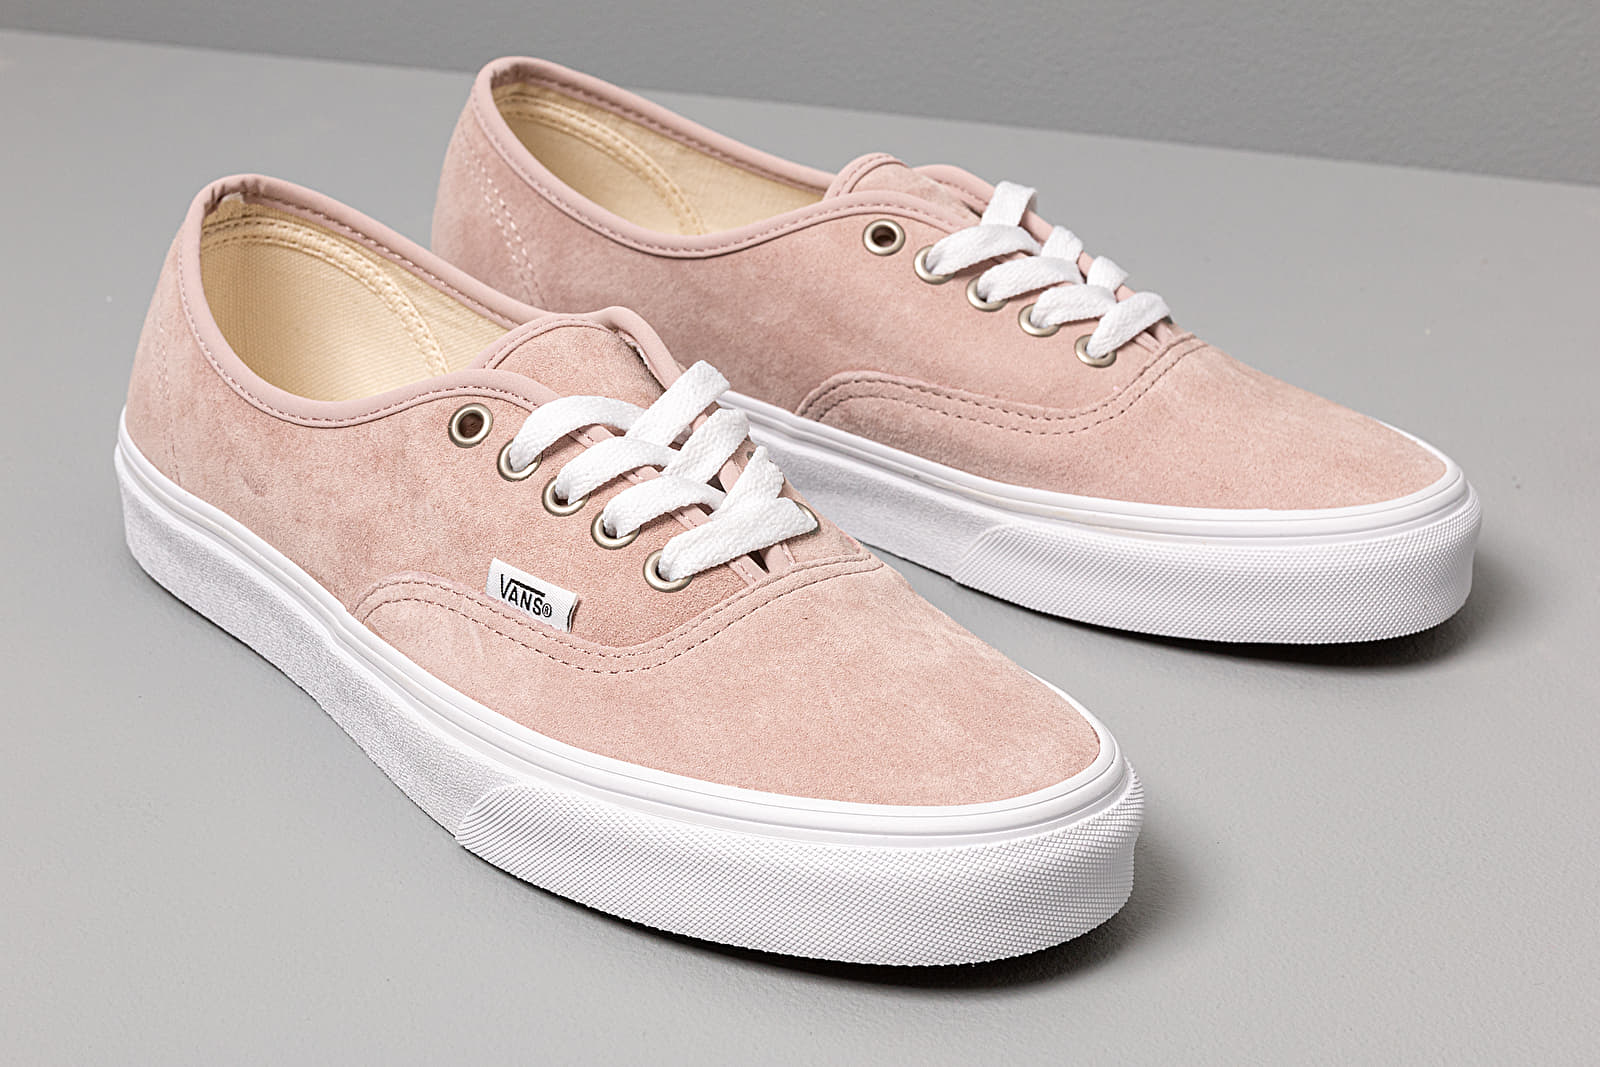 shoes Vans Authentic (PIG SUEDE) Shadow